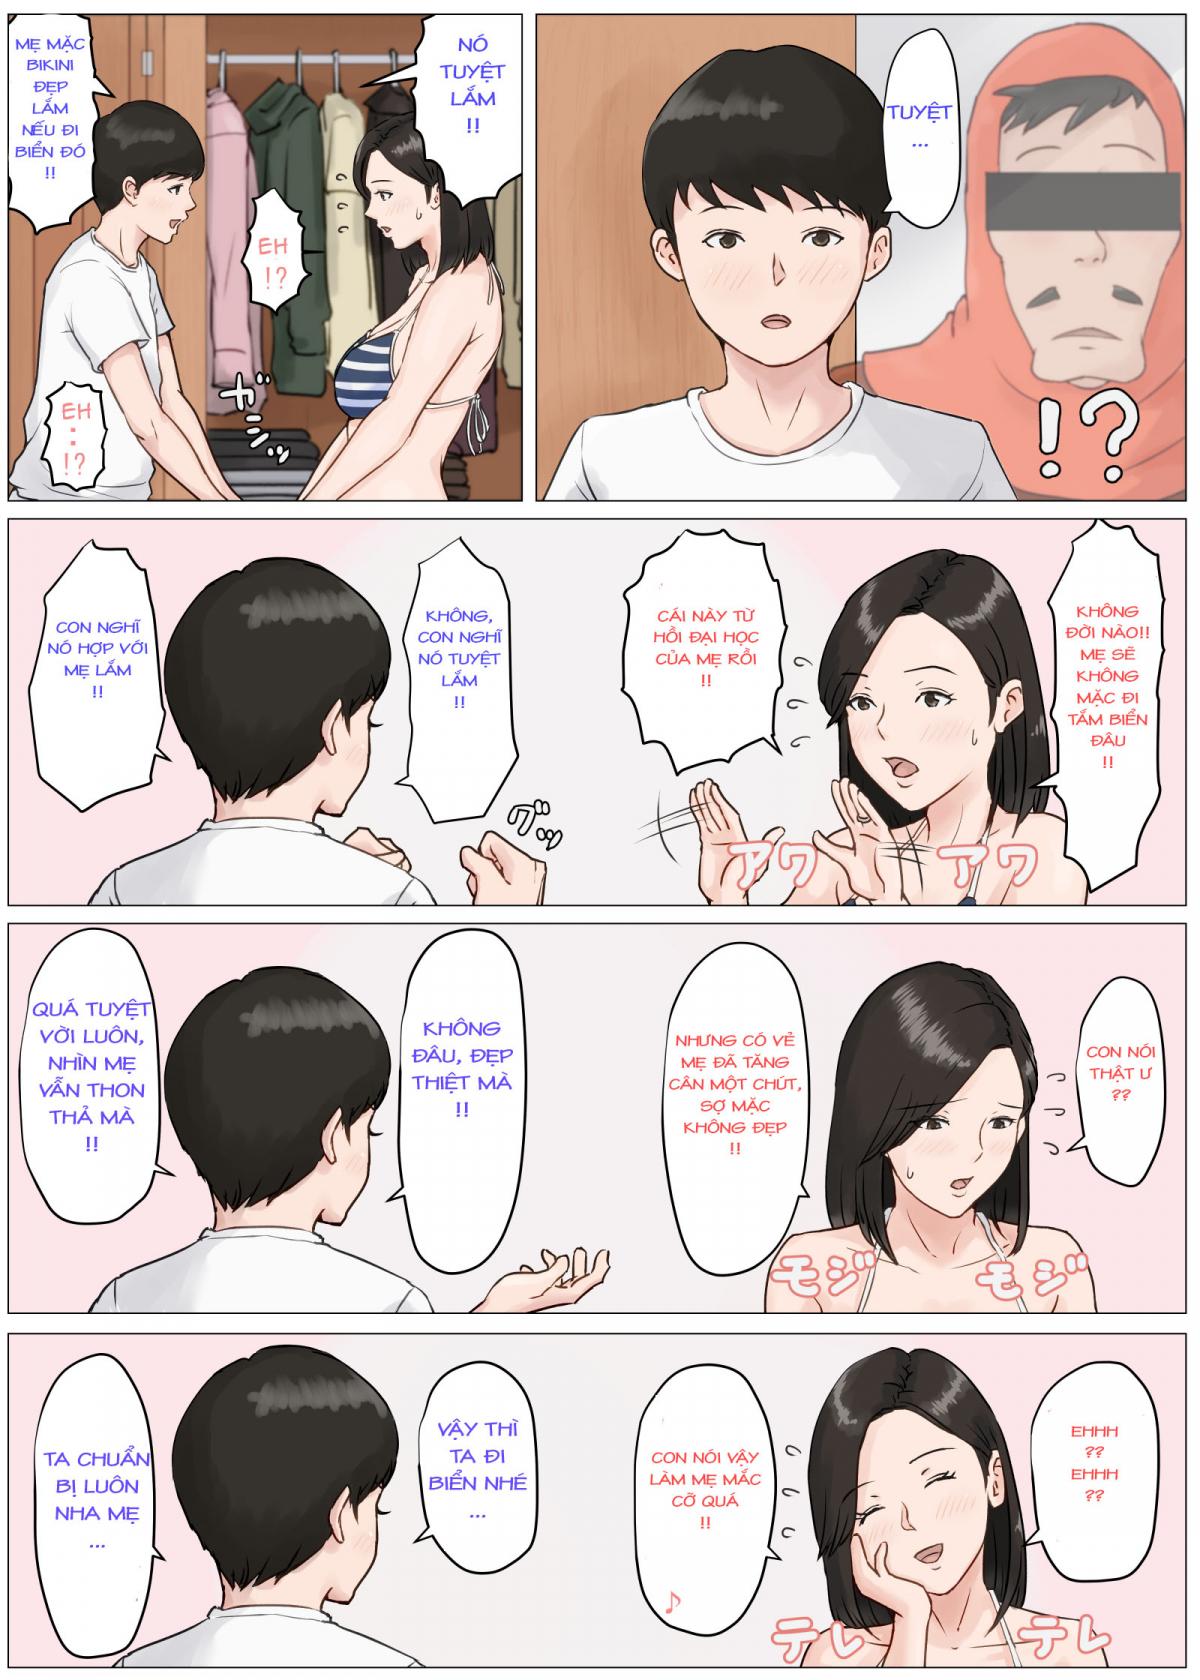 Hình ảnh  trong bài viết Truyện hentai Kaa-san Janakya Dame Nanda!! 3 ~Natsuyasumi Zenpen